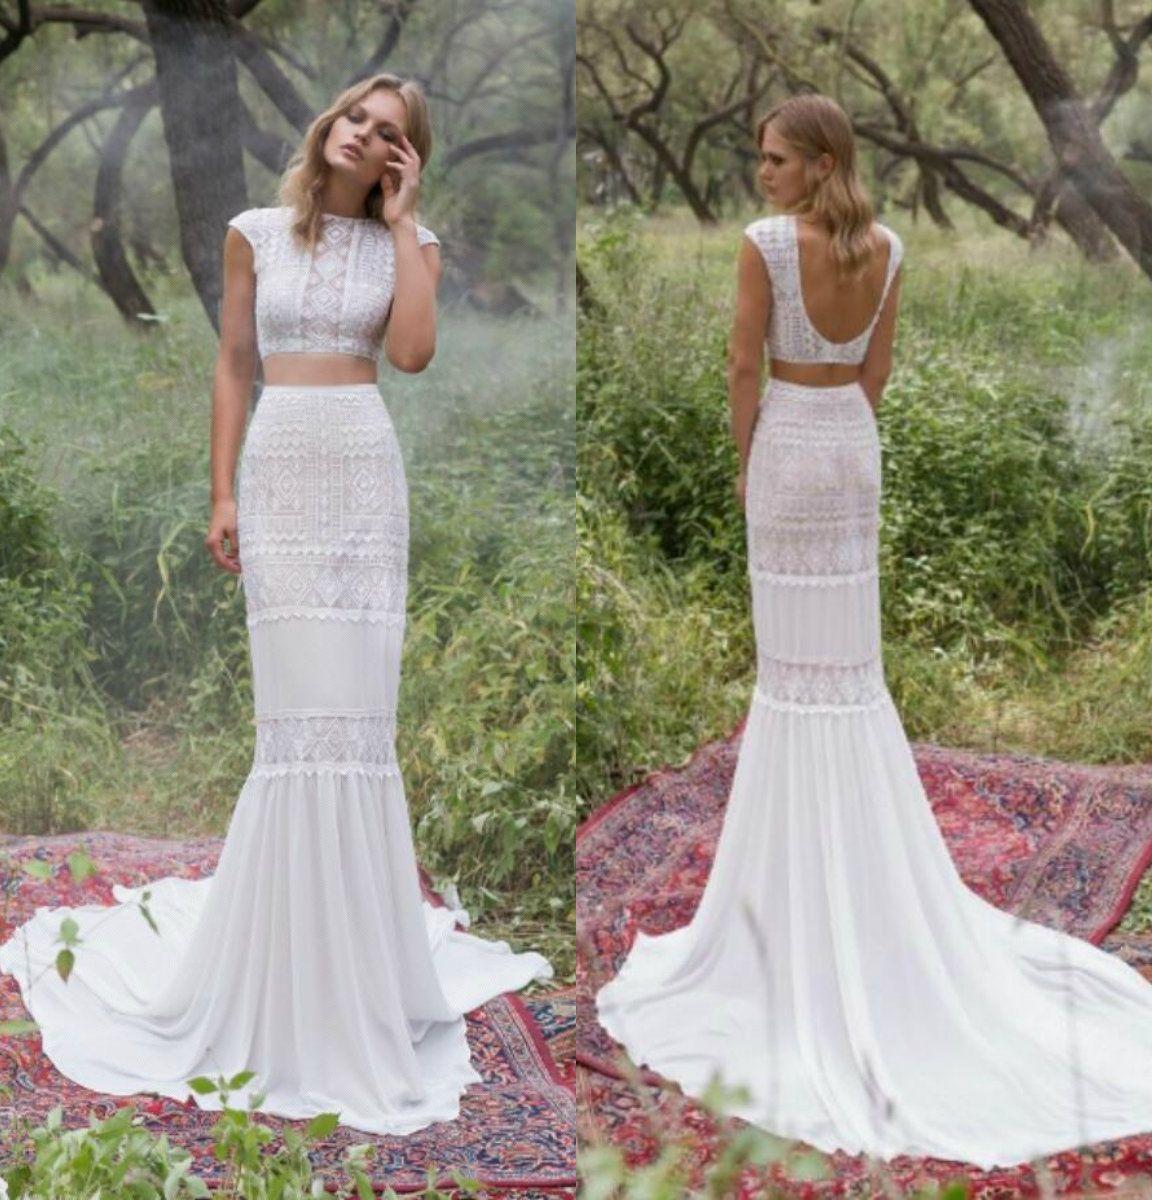 Zwei Stücke Brautkleider Spitze-Stickerei-Juwel Ansatz Kappen-Hülsen-Nixe-Hochzeits-Kleid Sweep Zug Backless Plus Size Robe De Mariee